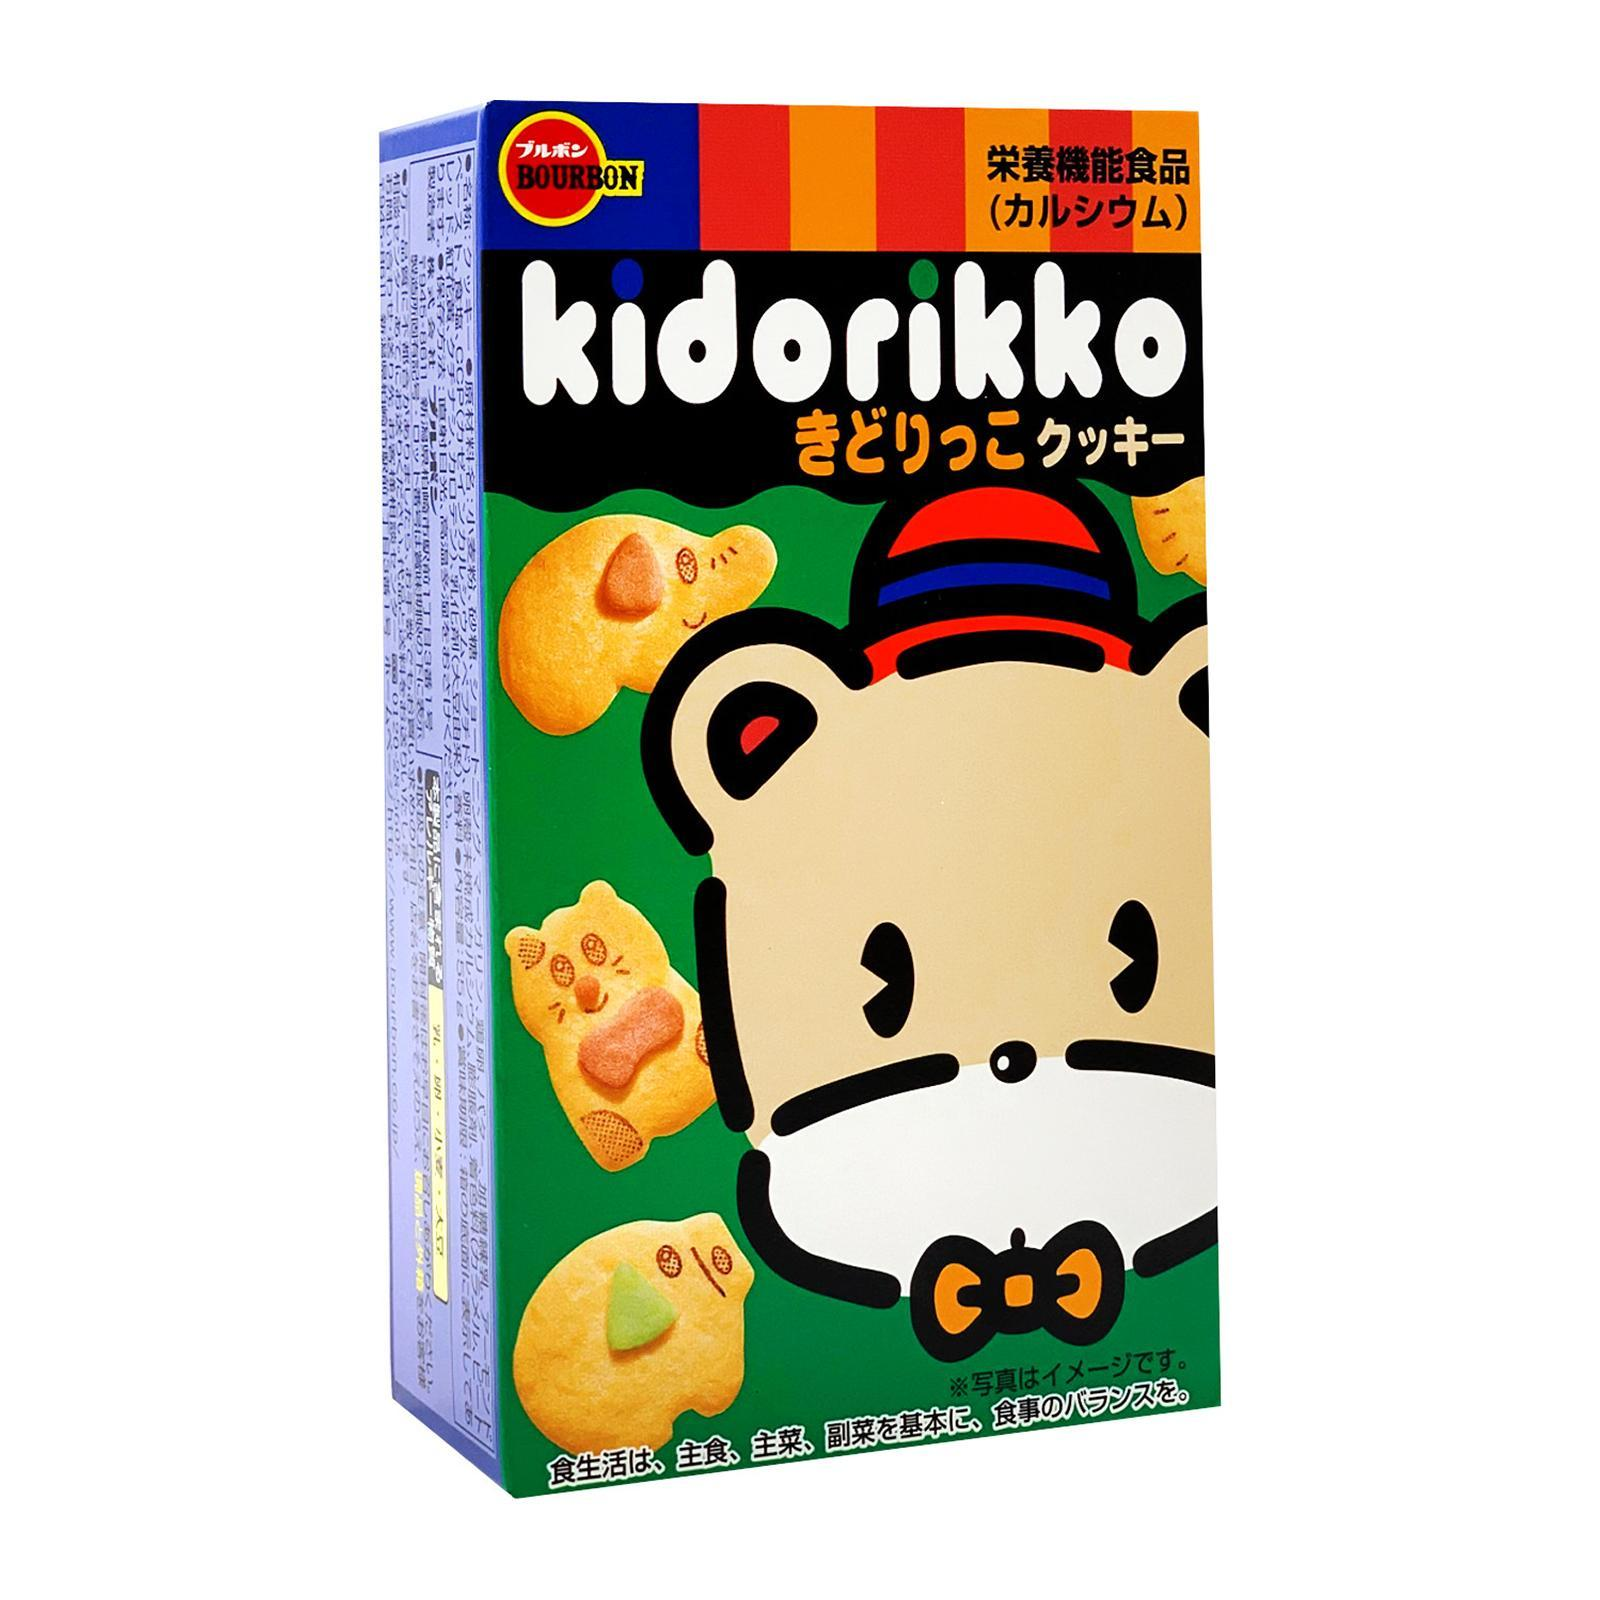 BOURBON Kidorikko Animal-Shaped Biscuits